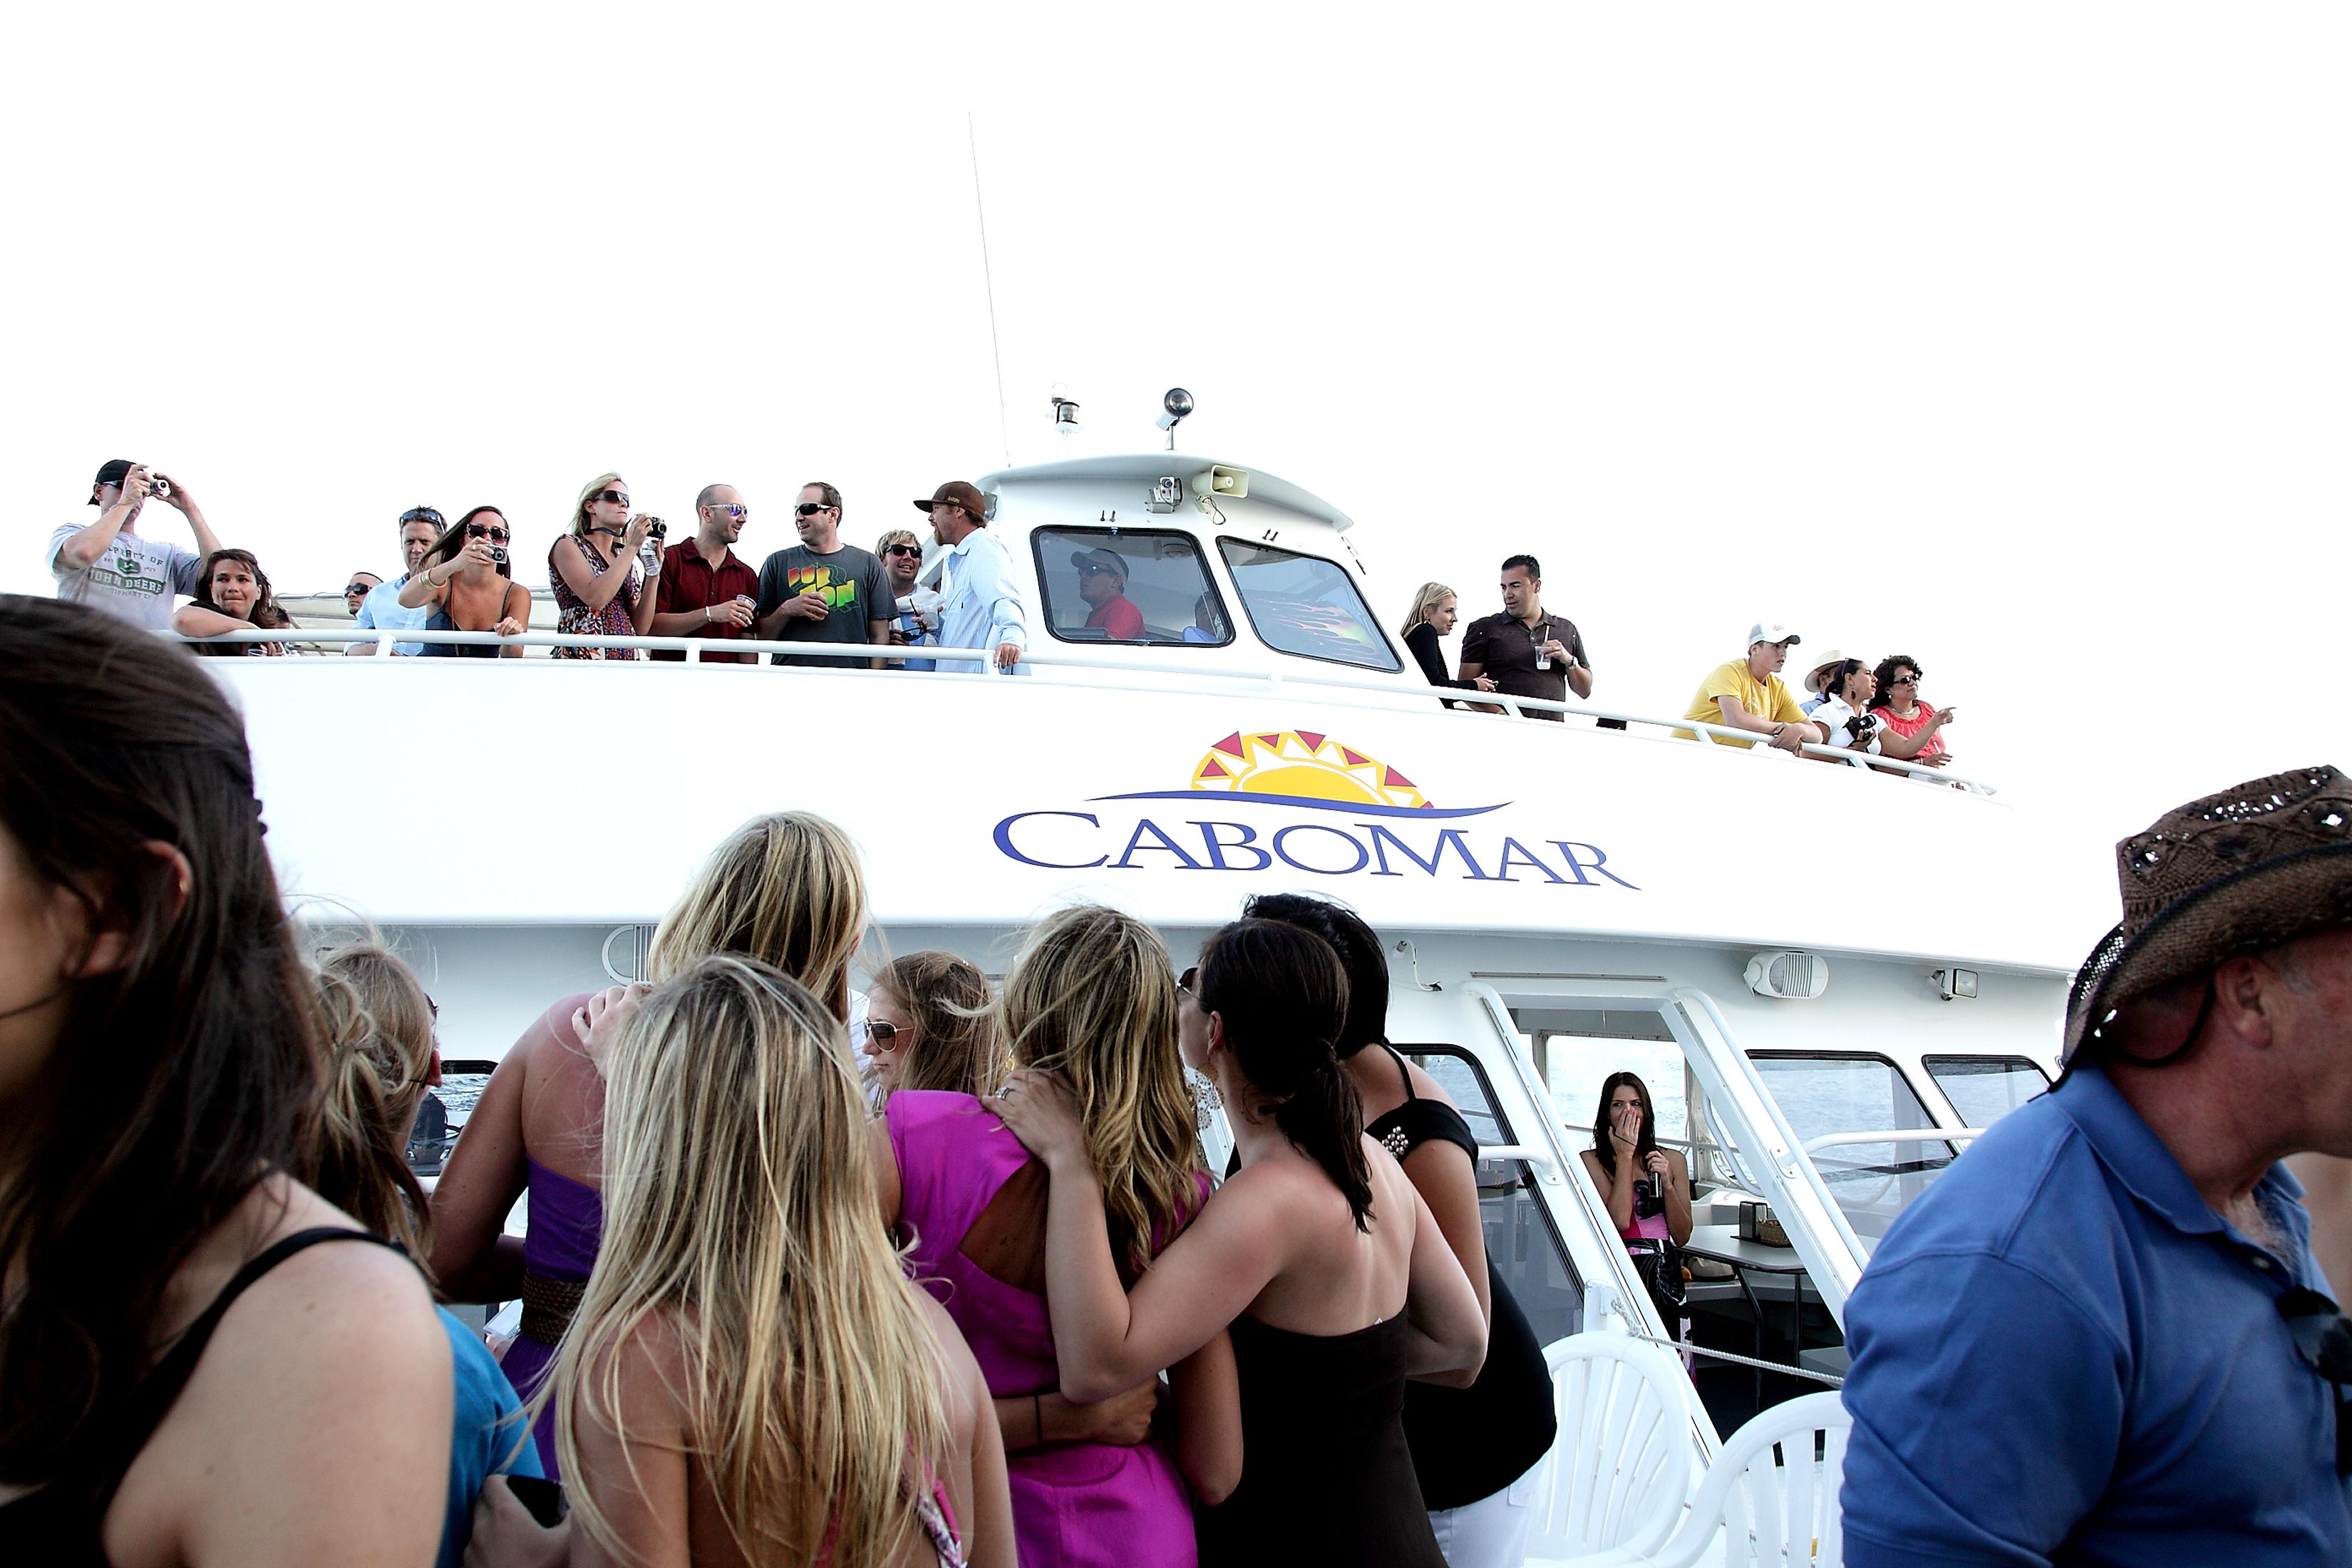 CaboMar Fiesta dinner Cruise